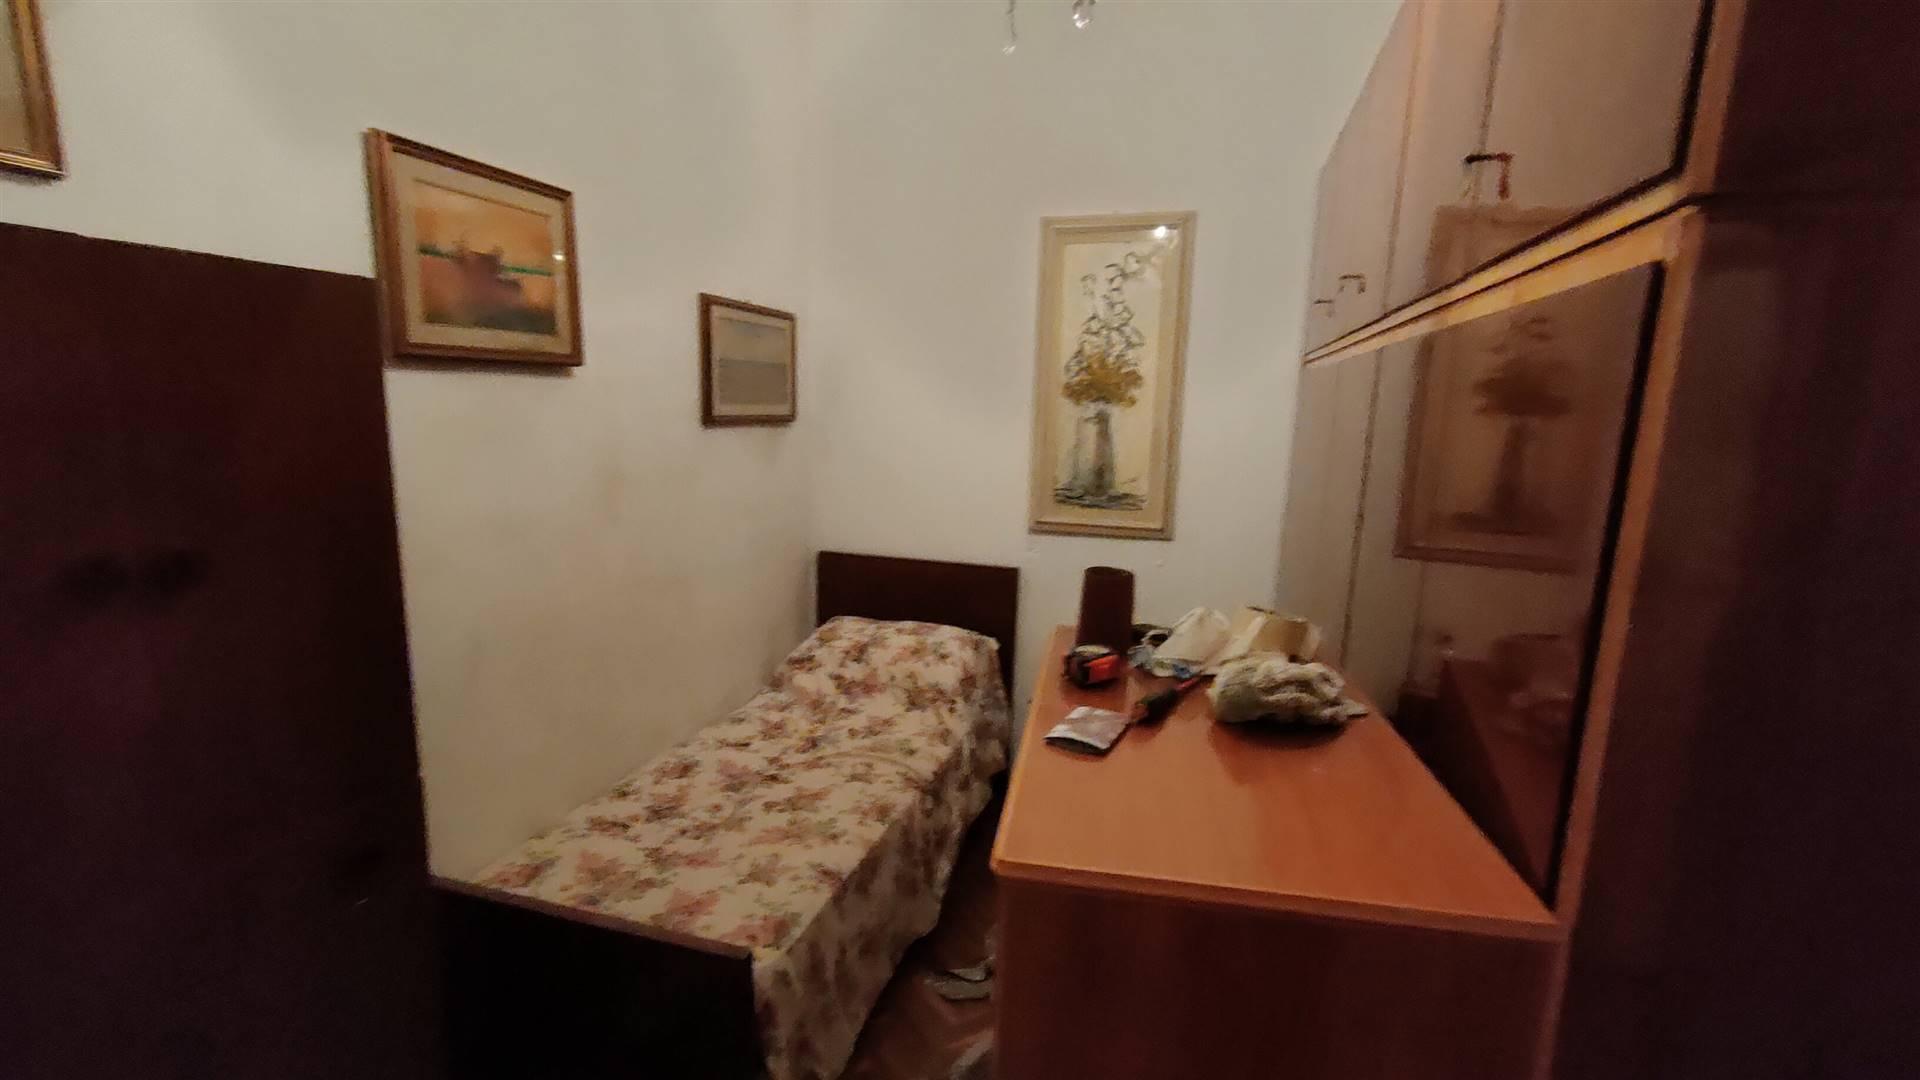 camera singola - Rif. 4909RA86197